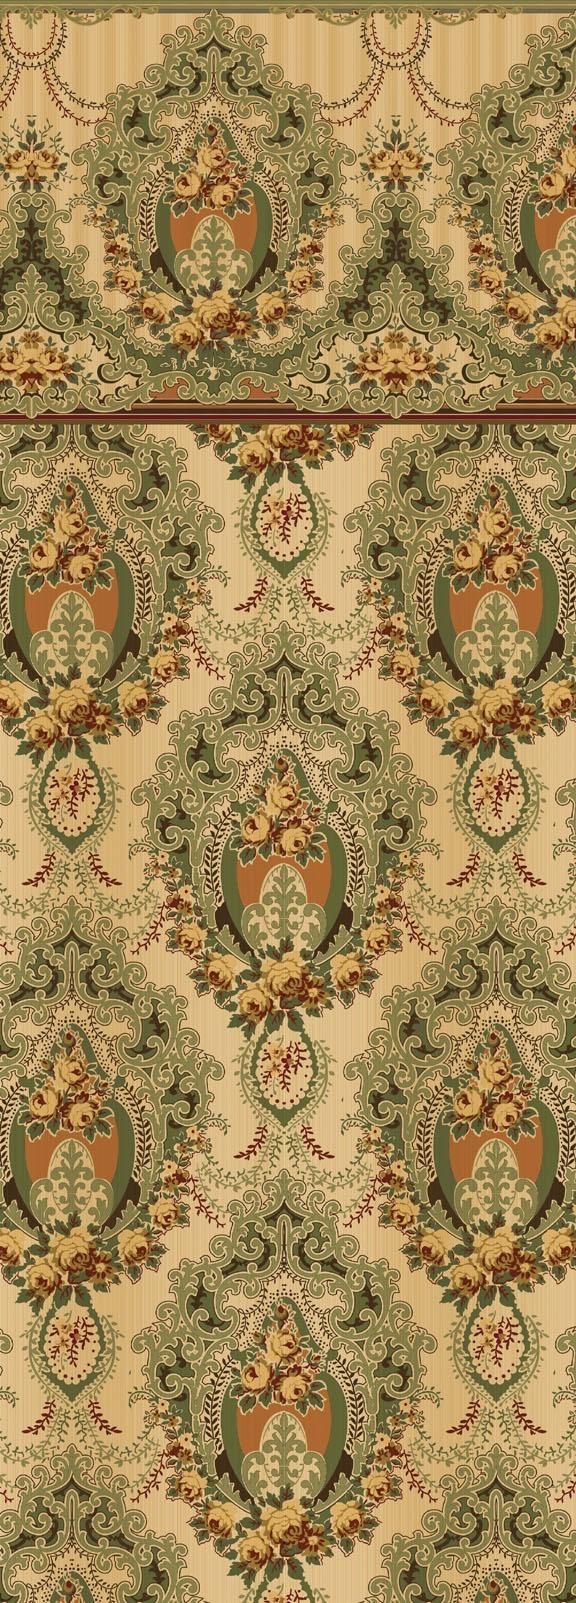 Best 25+ Victorian wallpaper ideas on Pinterest   Bedroom wallpaper victorian, Art nouveau ...